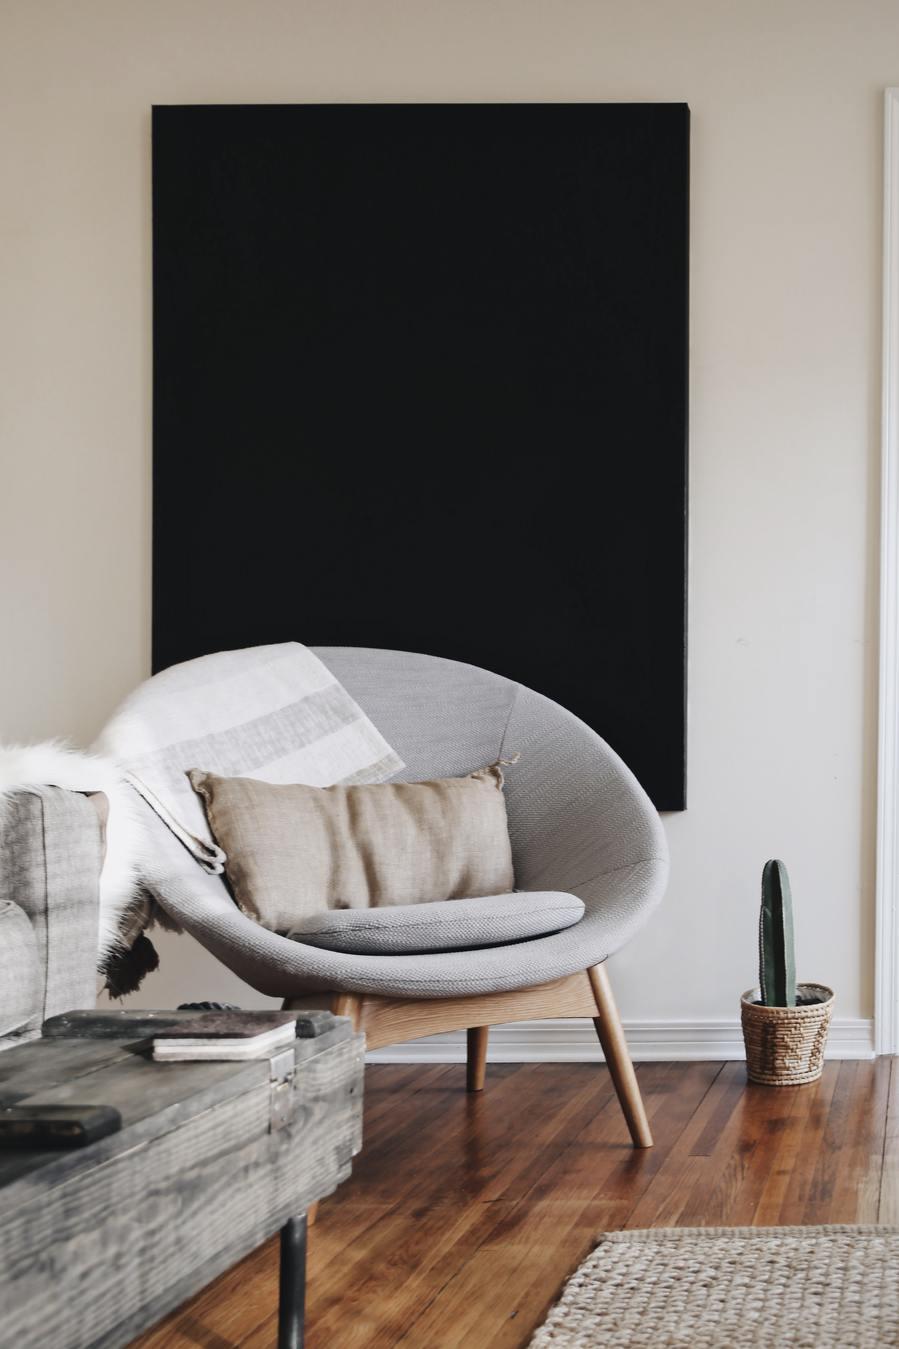 Lounge stoel in een woonkamer